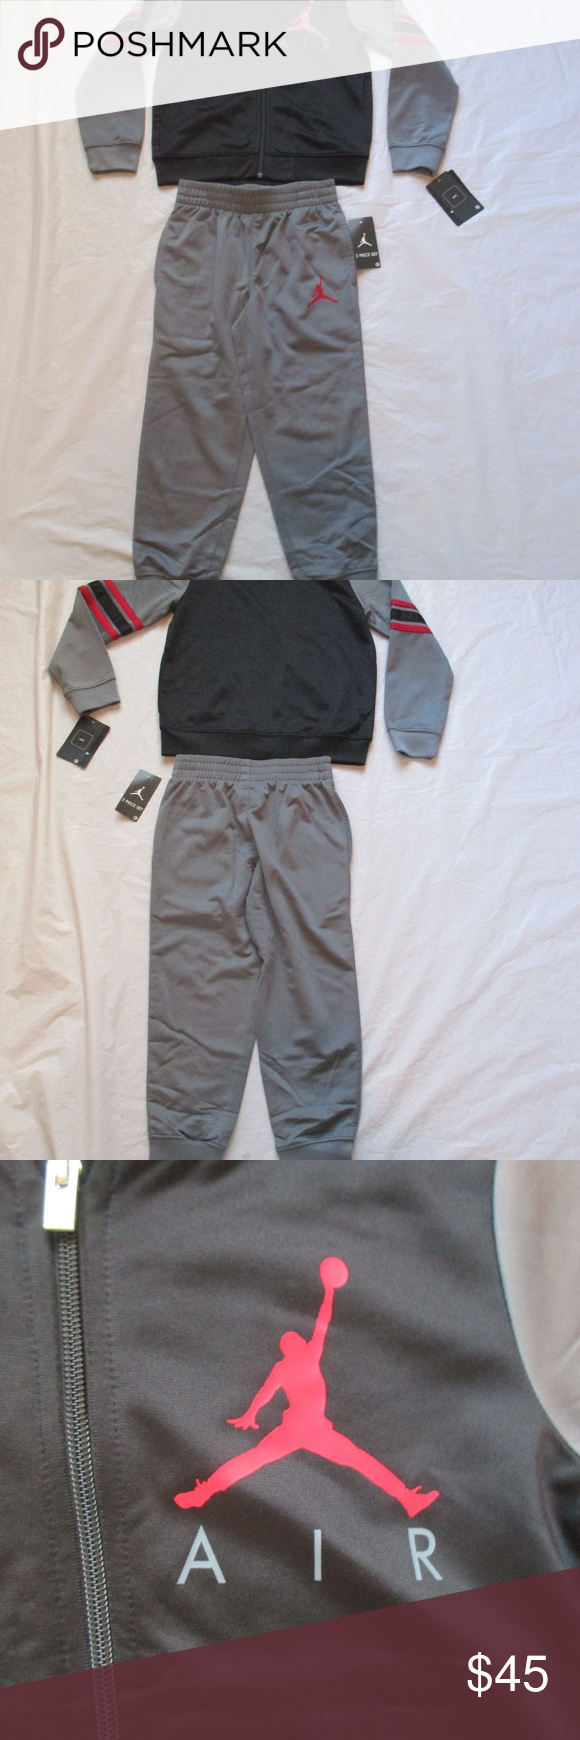 74563e62b59771 Nike Air Jordan Tracksuit 2 Piece Grey 854896-k26 Nike Air Jordan Boys Tracksuit  2 Piece Set Color Grey 854896-k26 Size 5 (4-5 Years) 104-110 cm ...